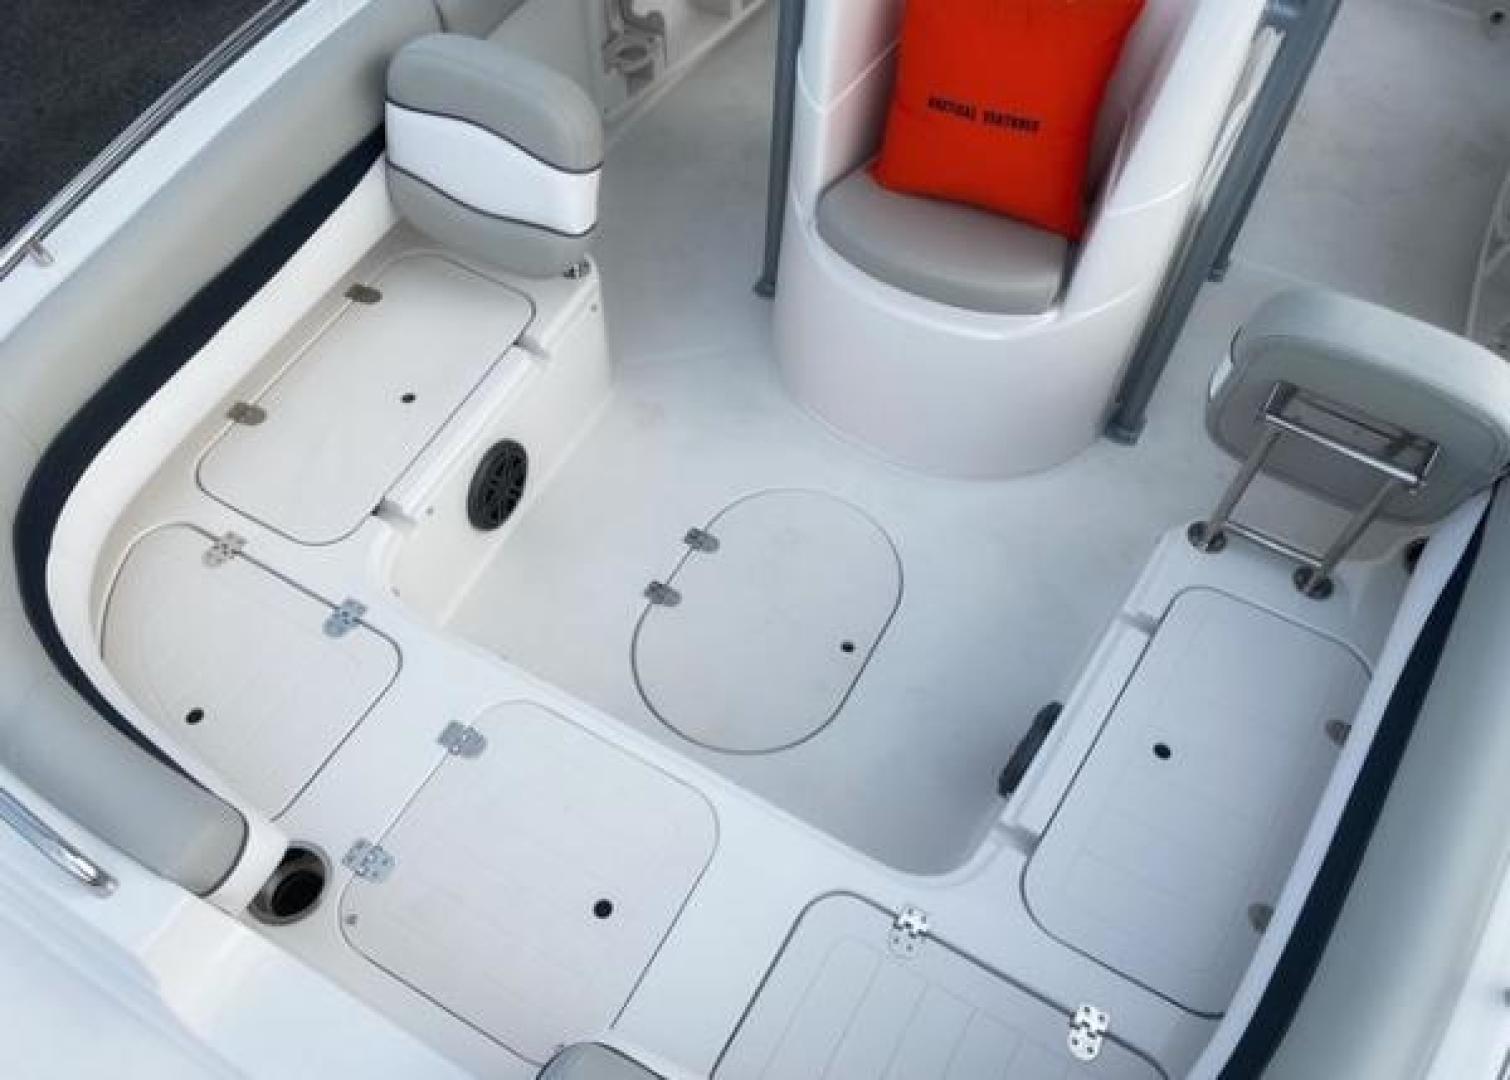 Starcraft-MDX 211 CC 2021-Starcraft MDX 211 CC Tampa Bay-Florida-United States-1532996 | Thumbnail